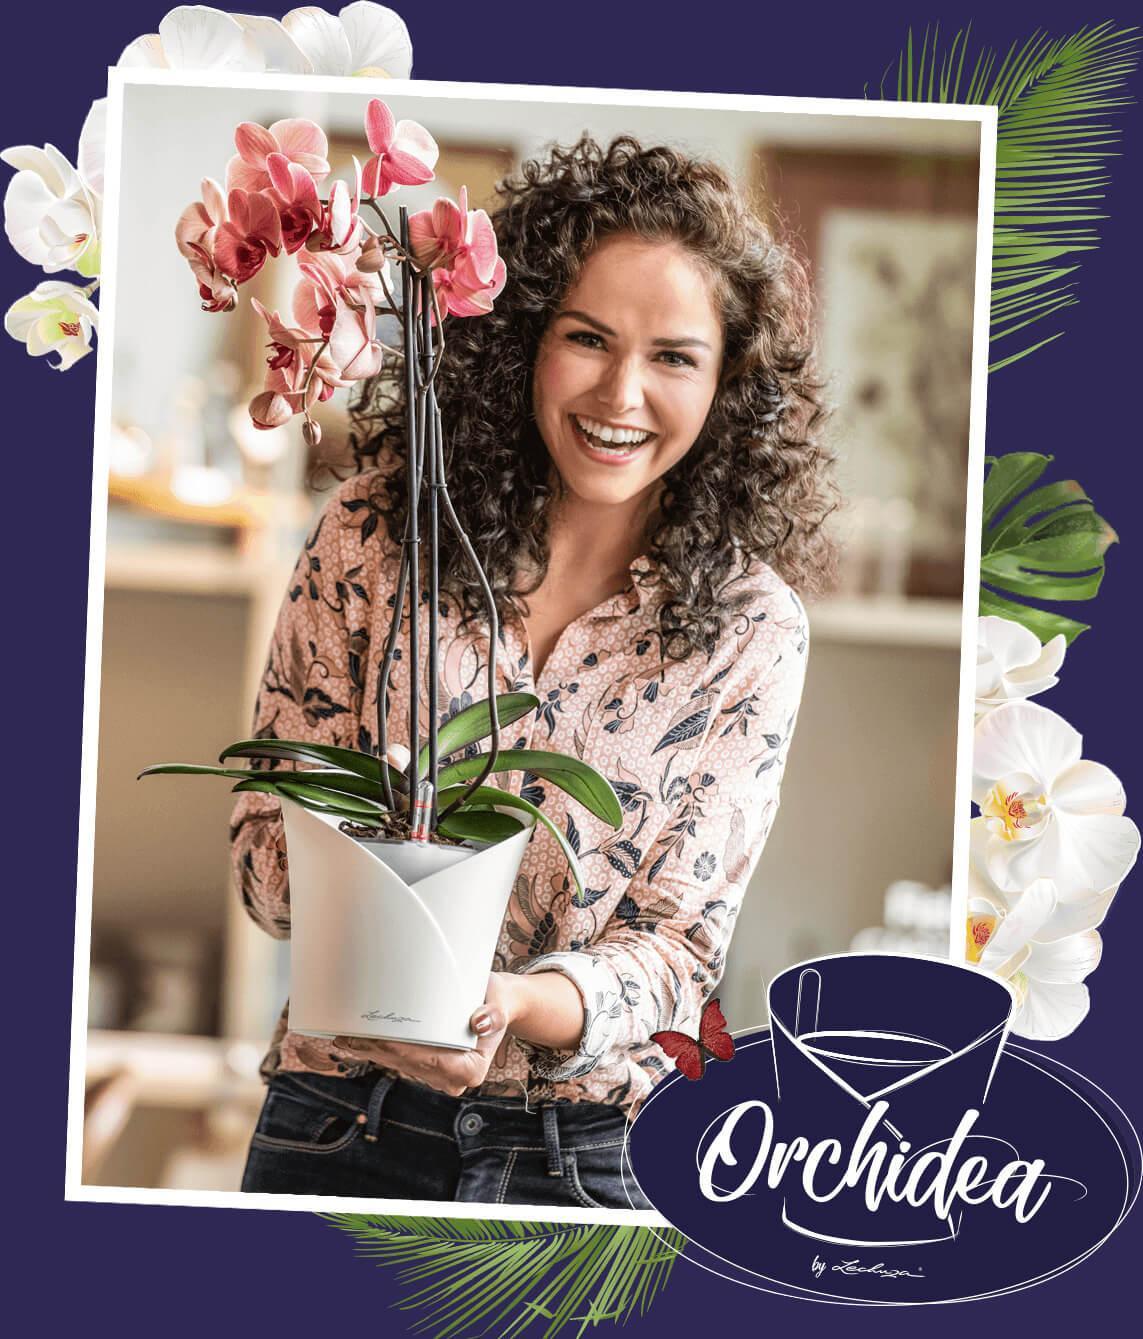 ORCHIDEA Der All-in-one Orchideentopf